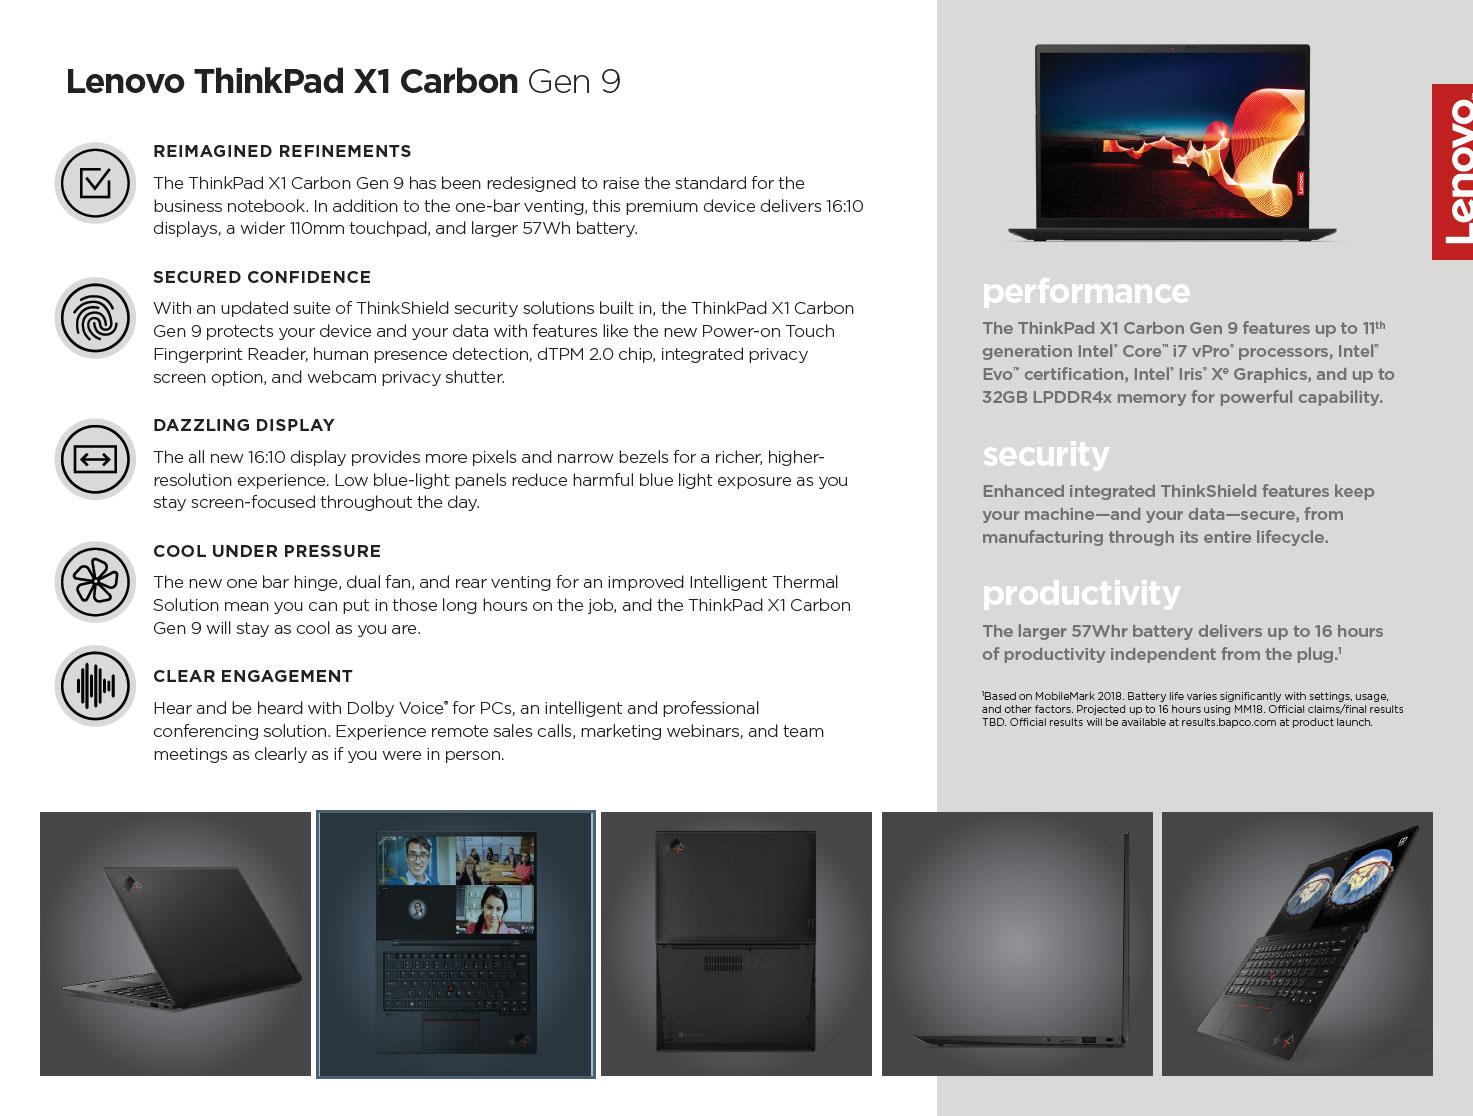 2021 Lenovo ThinkPad X1 Carob, gen 9